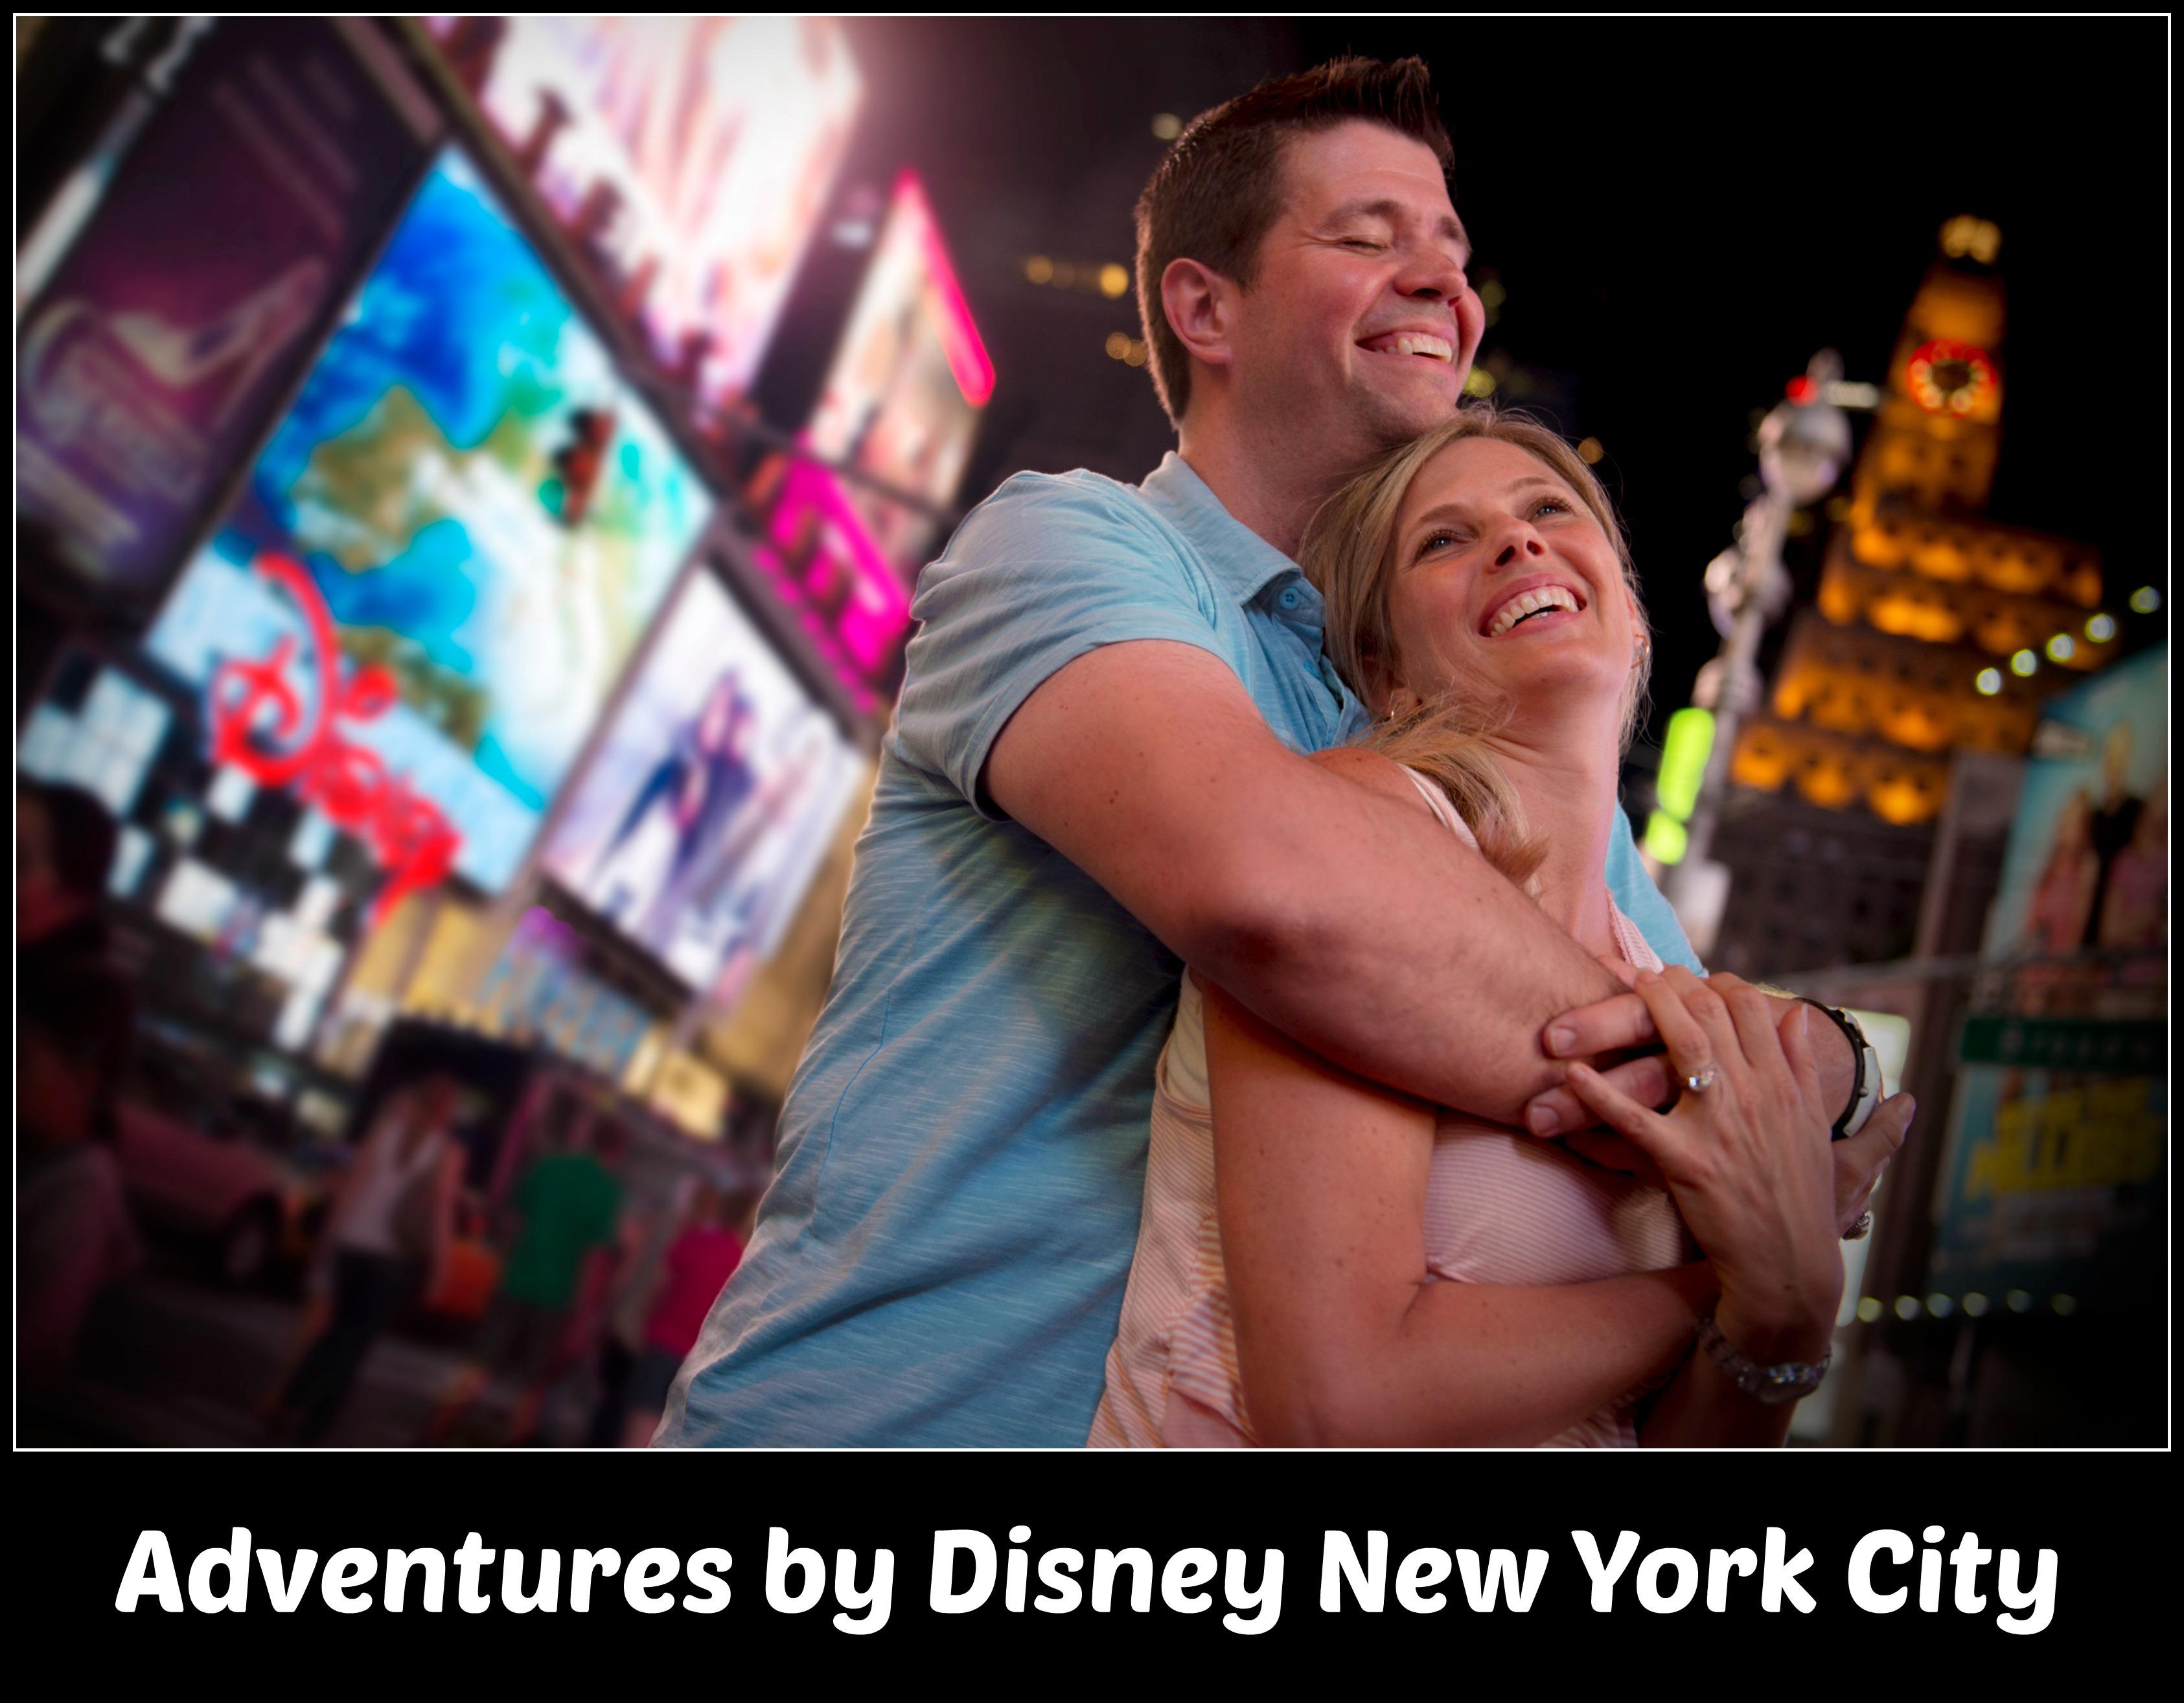 Adventures by Disney New York City